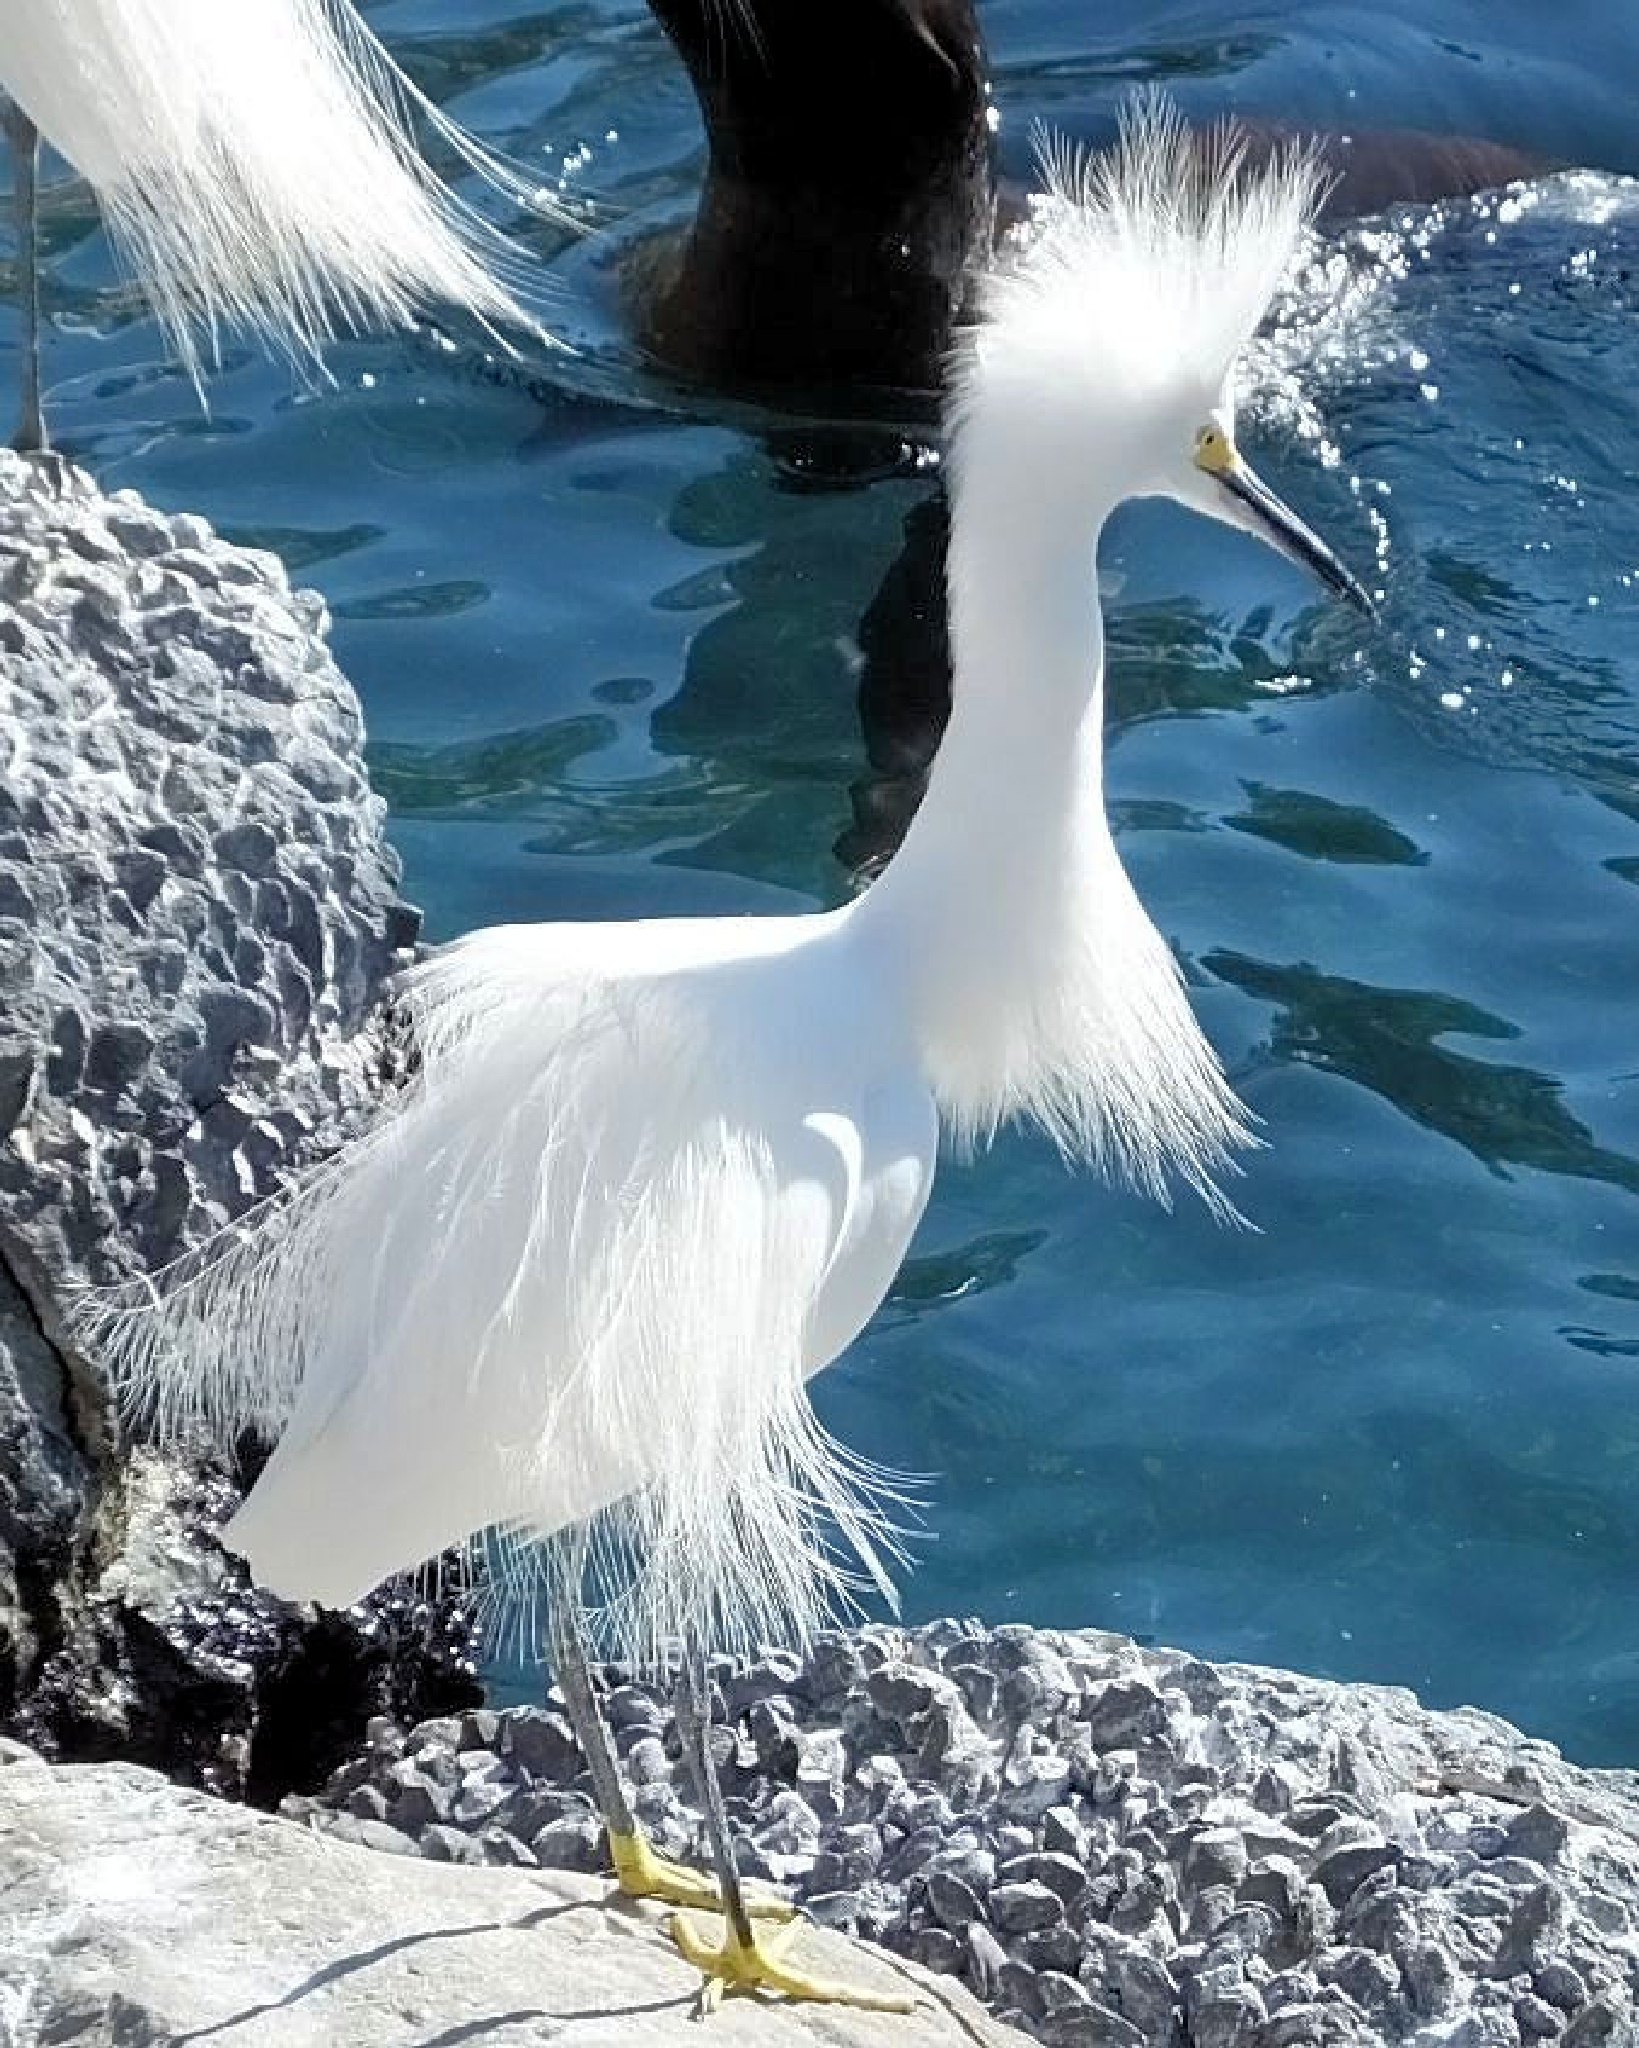 White Bird On Rocks by Lynn A Marie